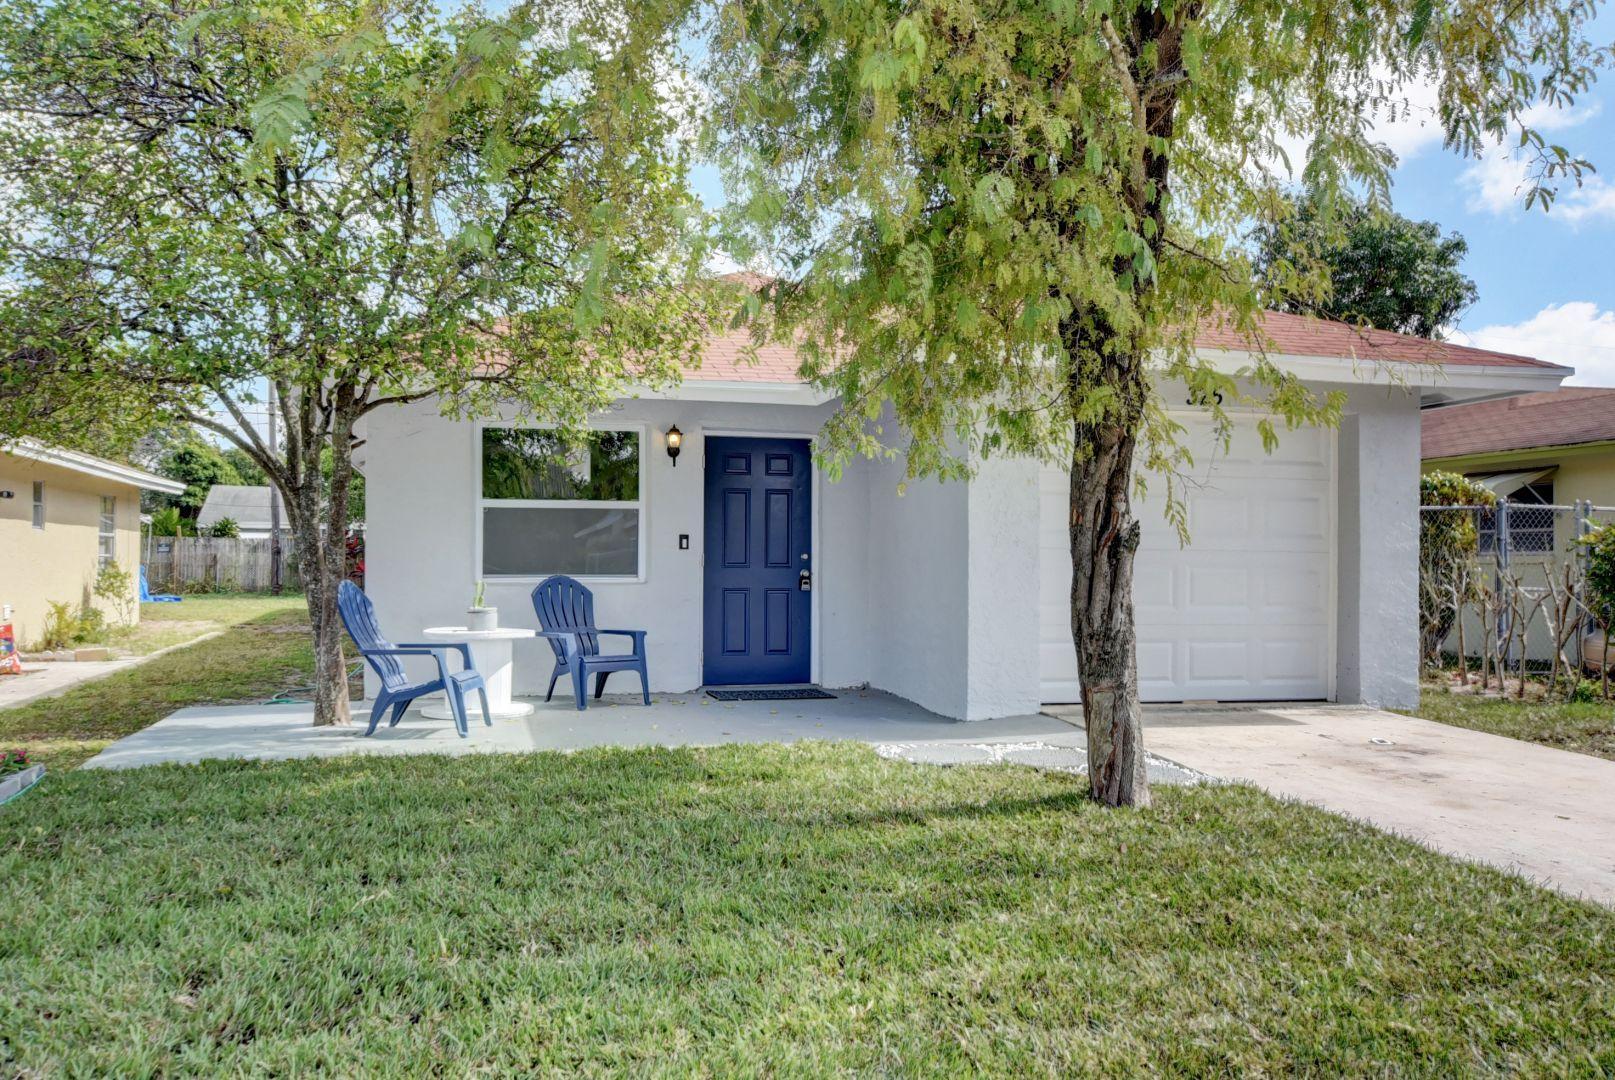 325 4th Avenue, Delray Beach, Florida 33444, 4 Bedrooms Bedrooms, ,2 BathroomsBathrooms,Single Family,For Sale,4th,RX-10503076